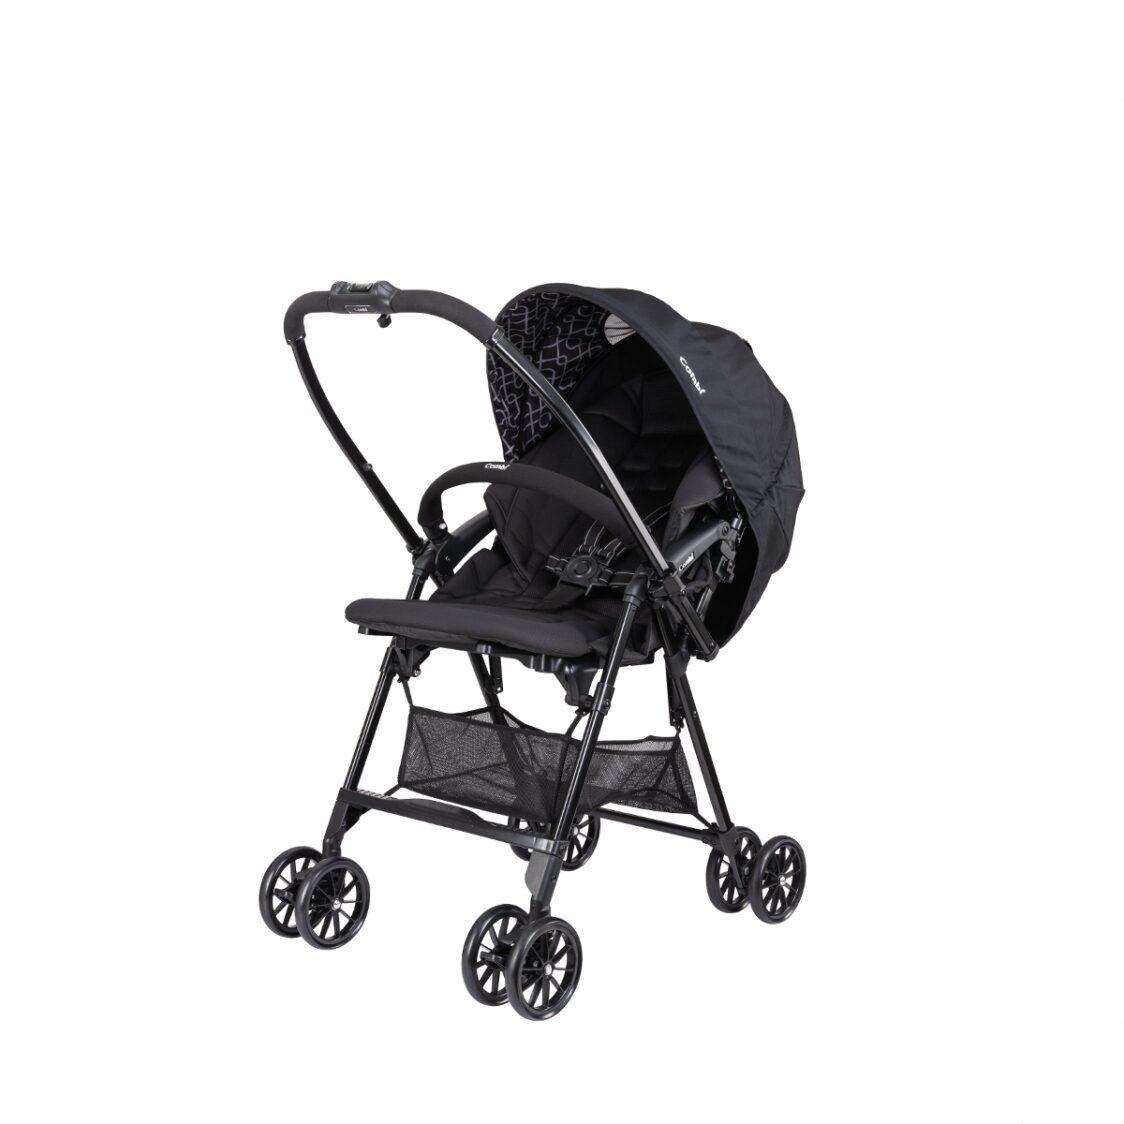 Combi Neyo Plus Black Stroller 148 Months 48KG